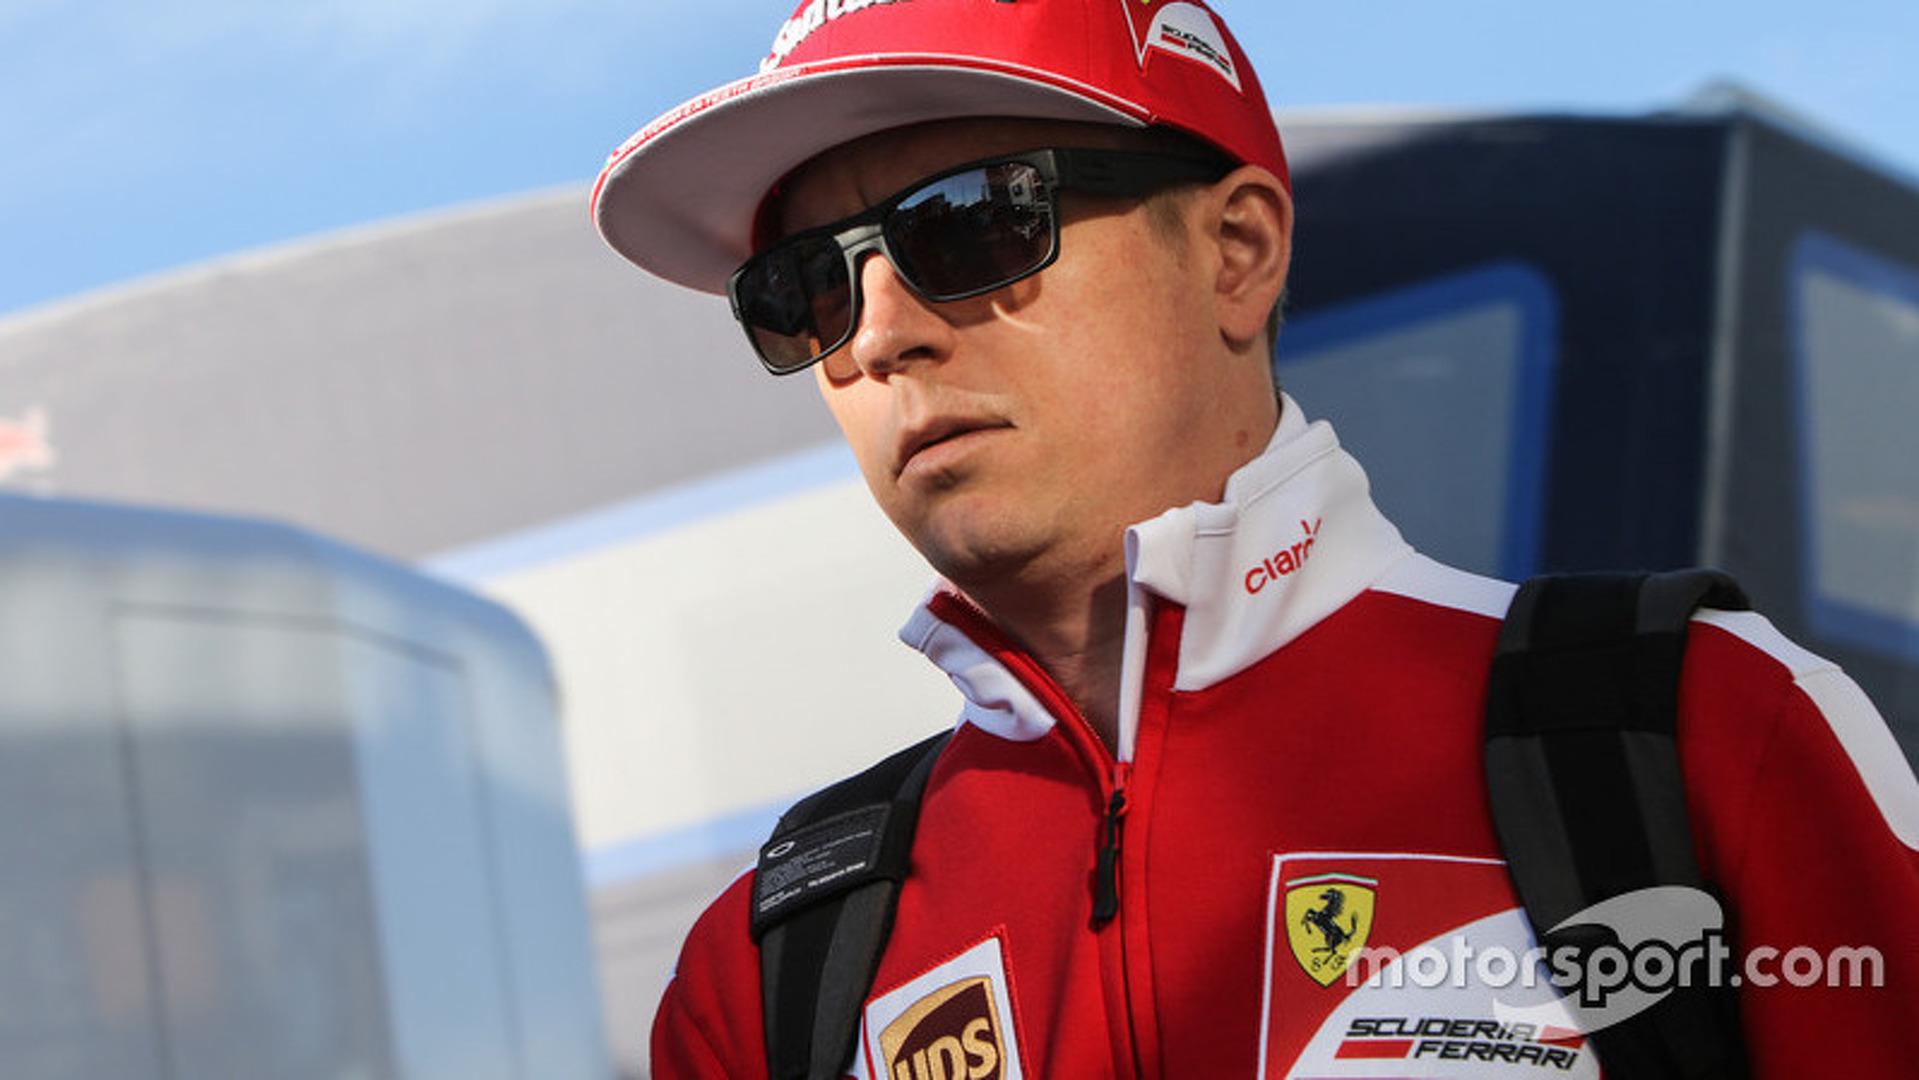 Ferrari hints at new deal for Raikkonen